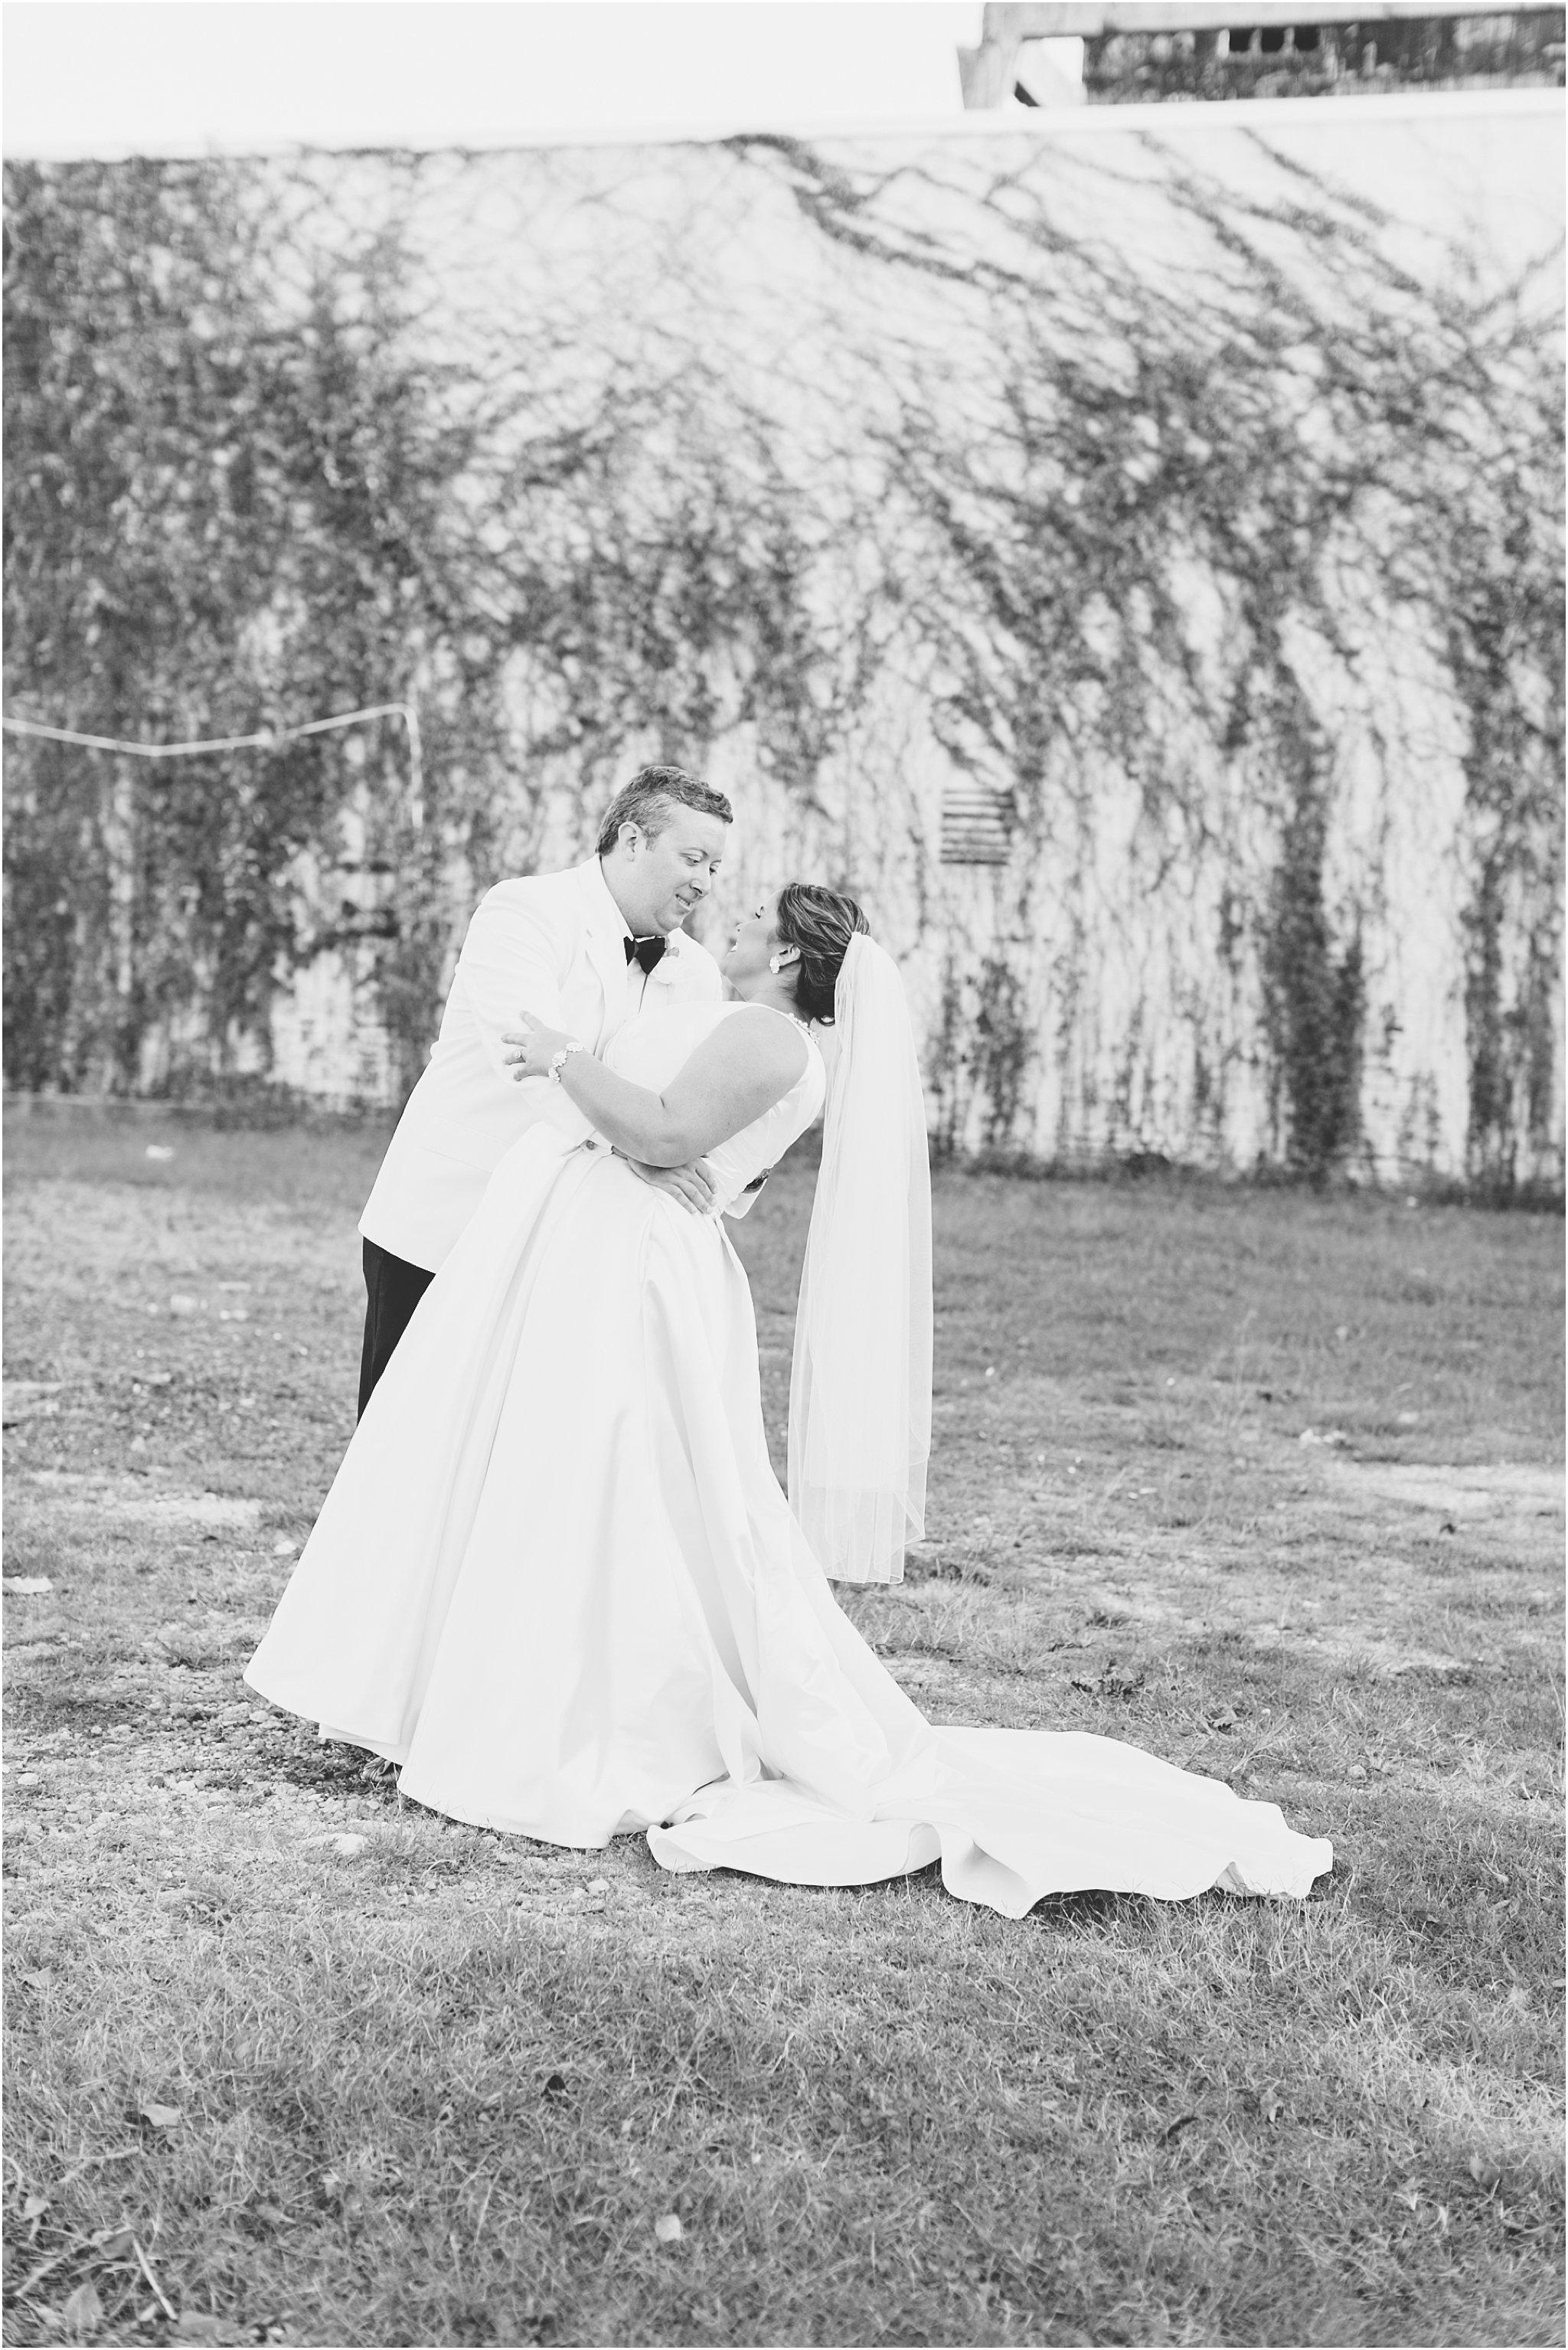 va_jessica_ryan_photography_virginia_wedding_norfolk_harrison_opera_house_norfolk_arts_district_portraits_3820